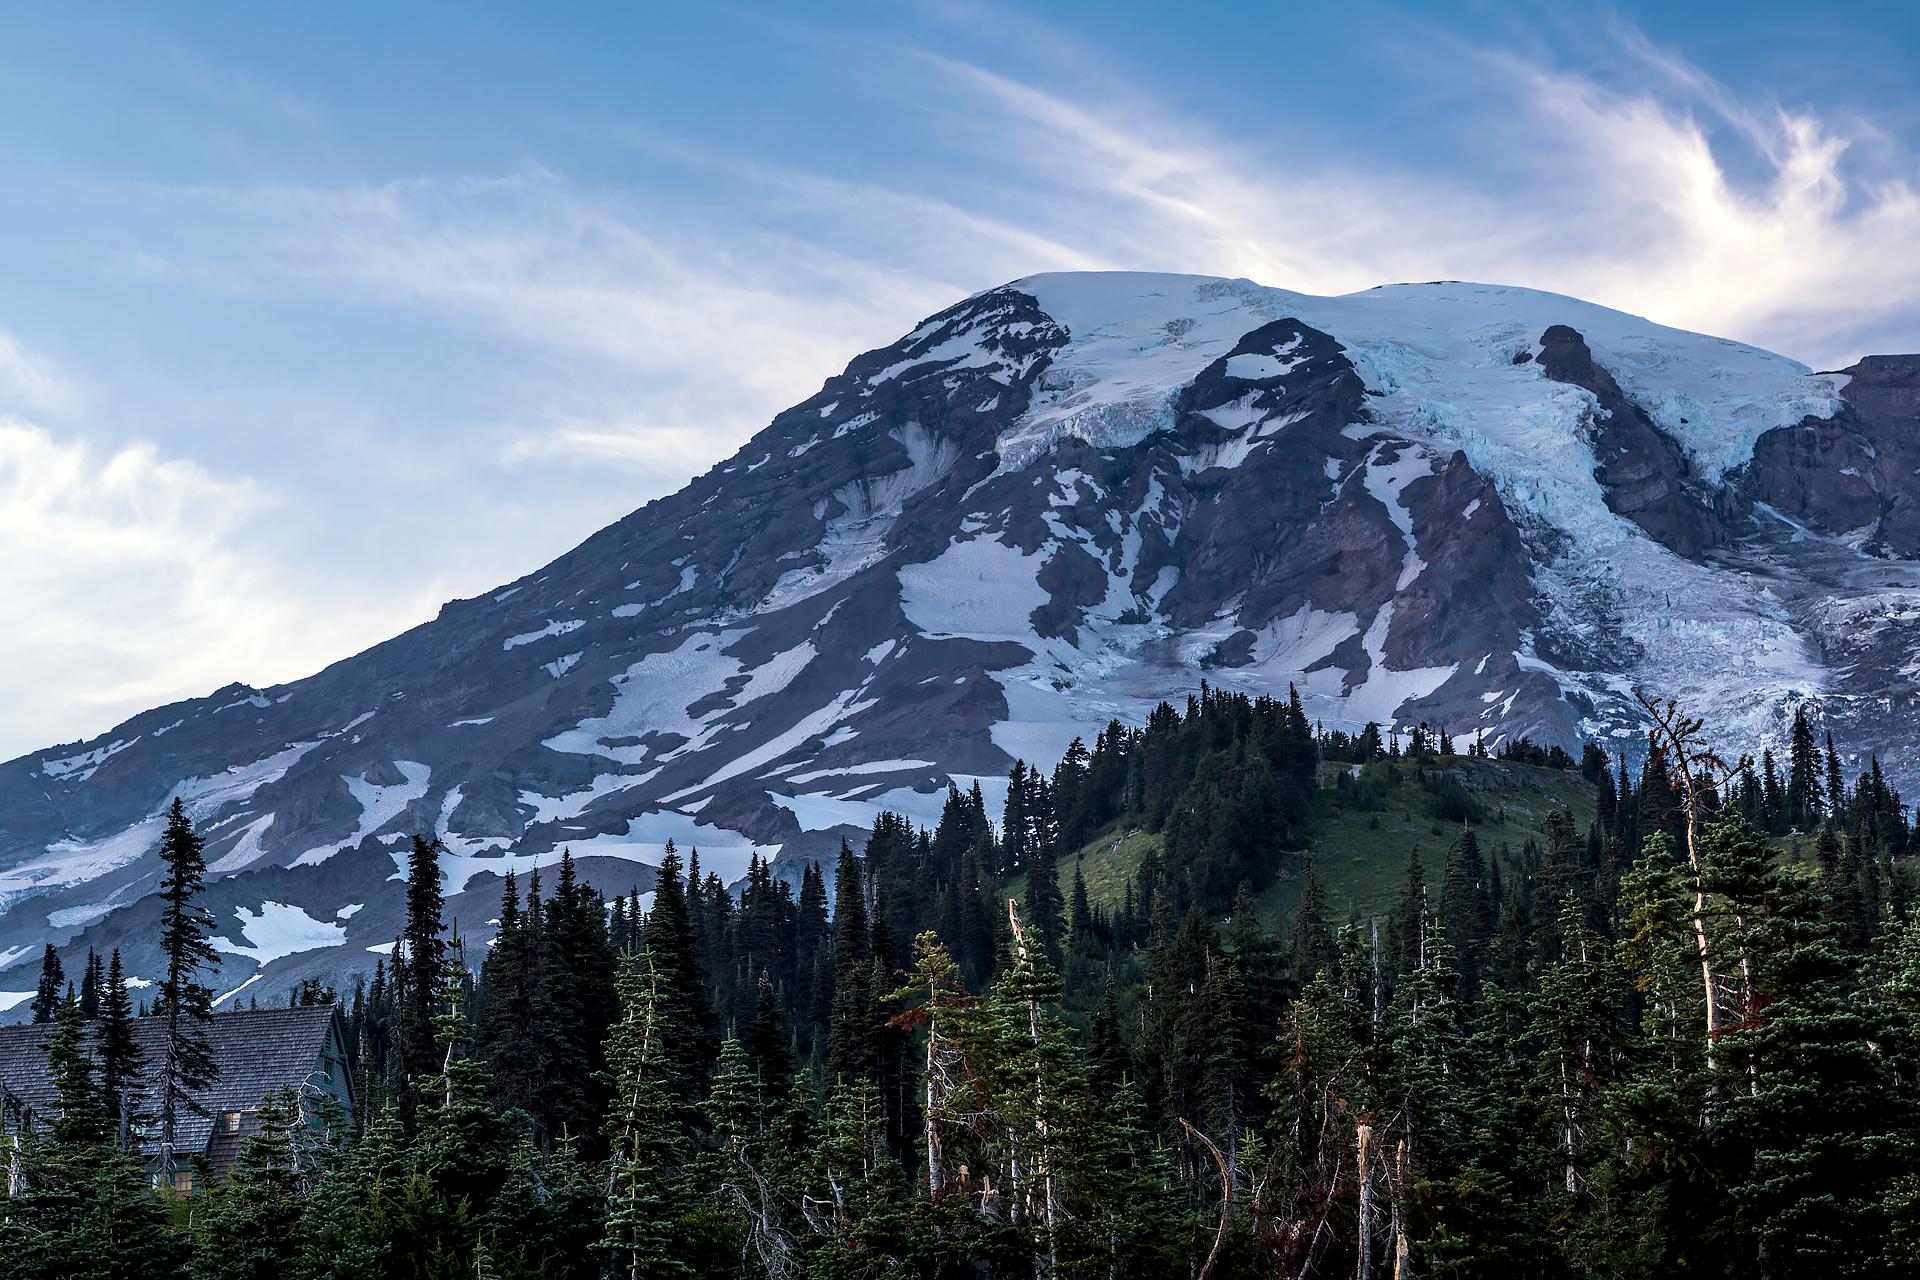 20130821-Mount-Rainier-Day-1-112.jpg